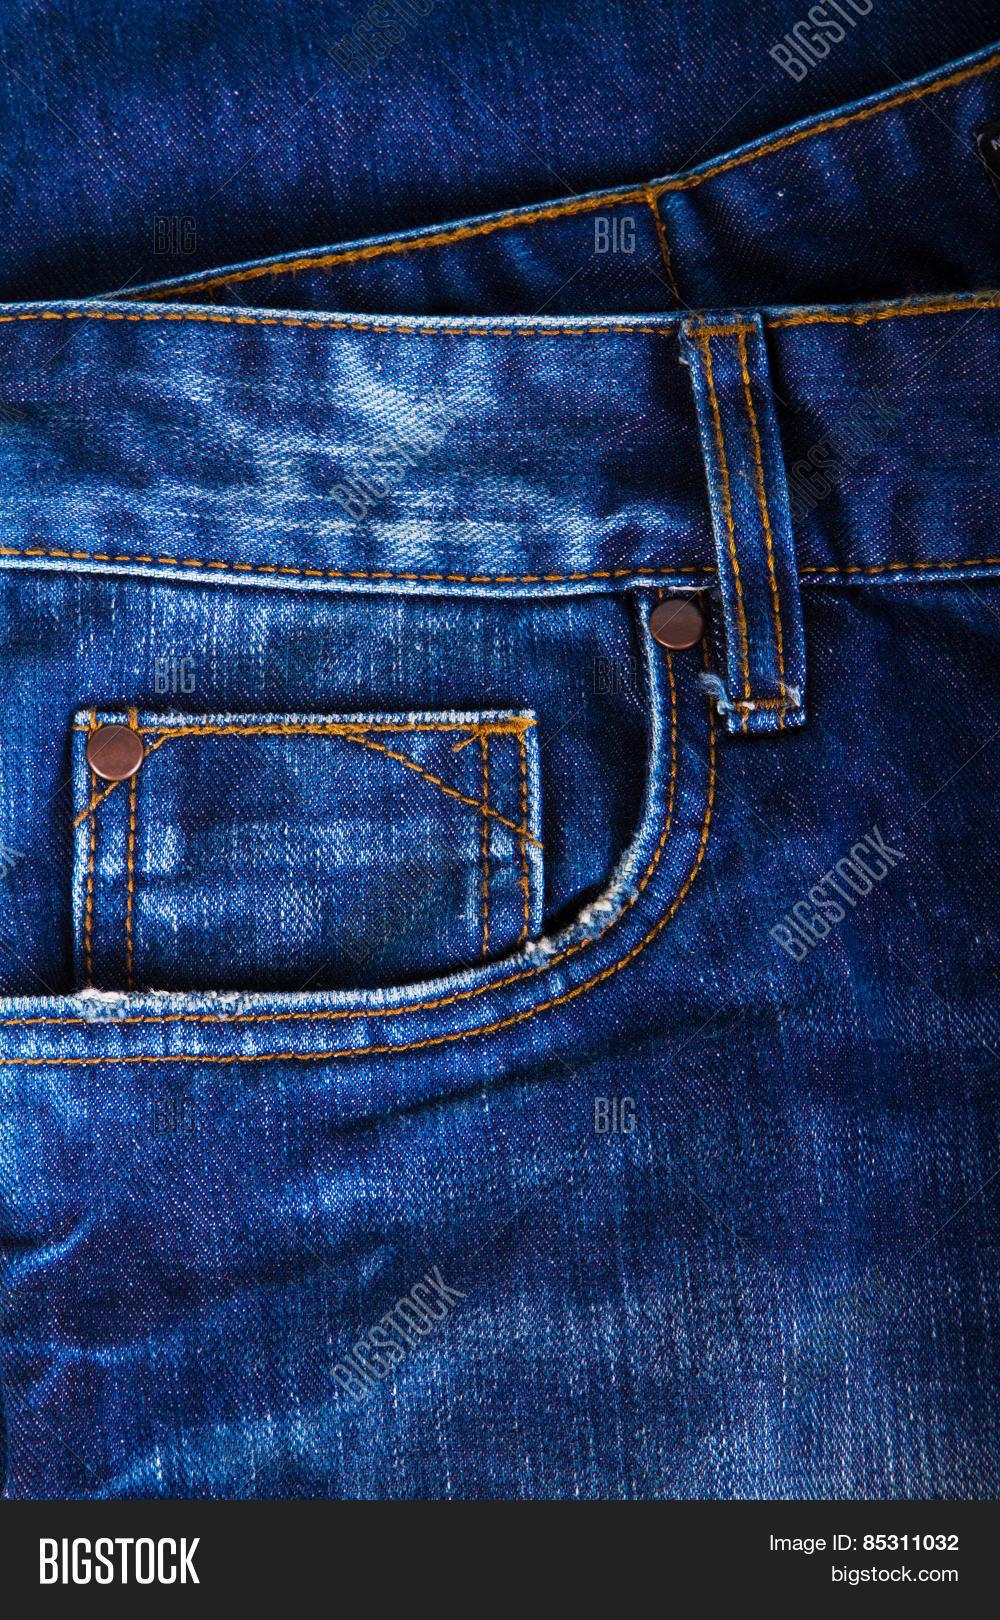 Снимает джинси фото 1 фотография